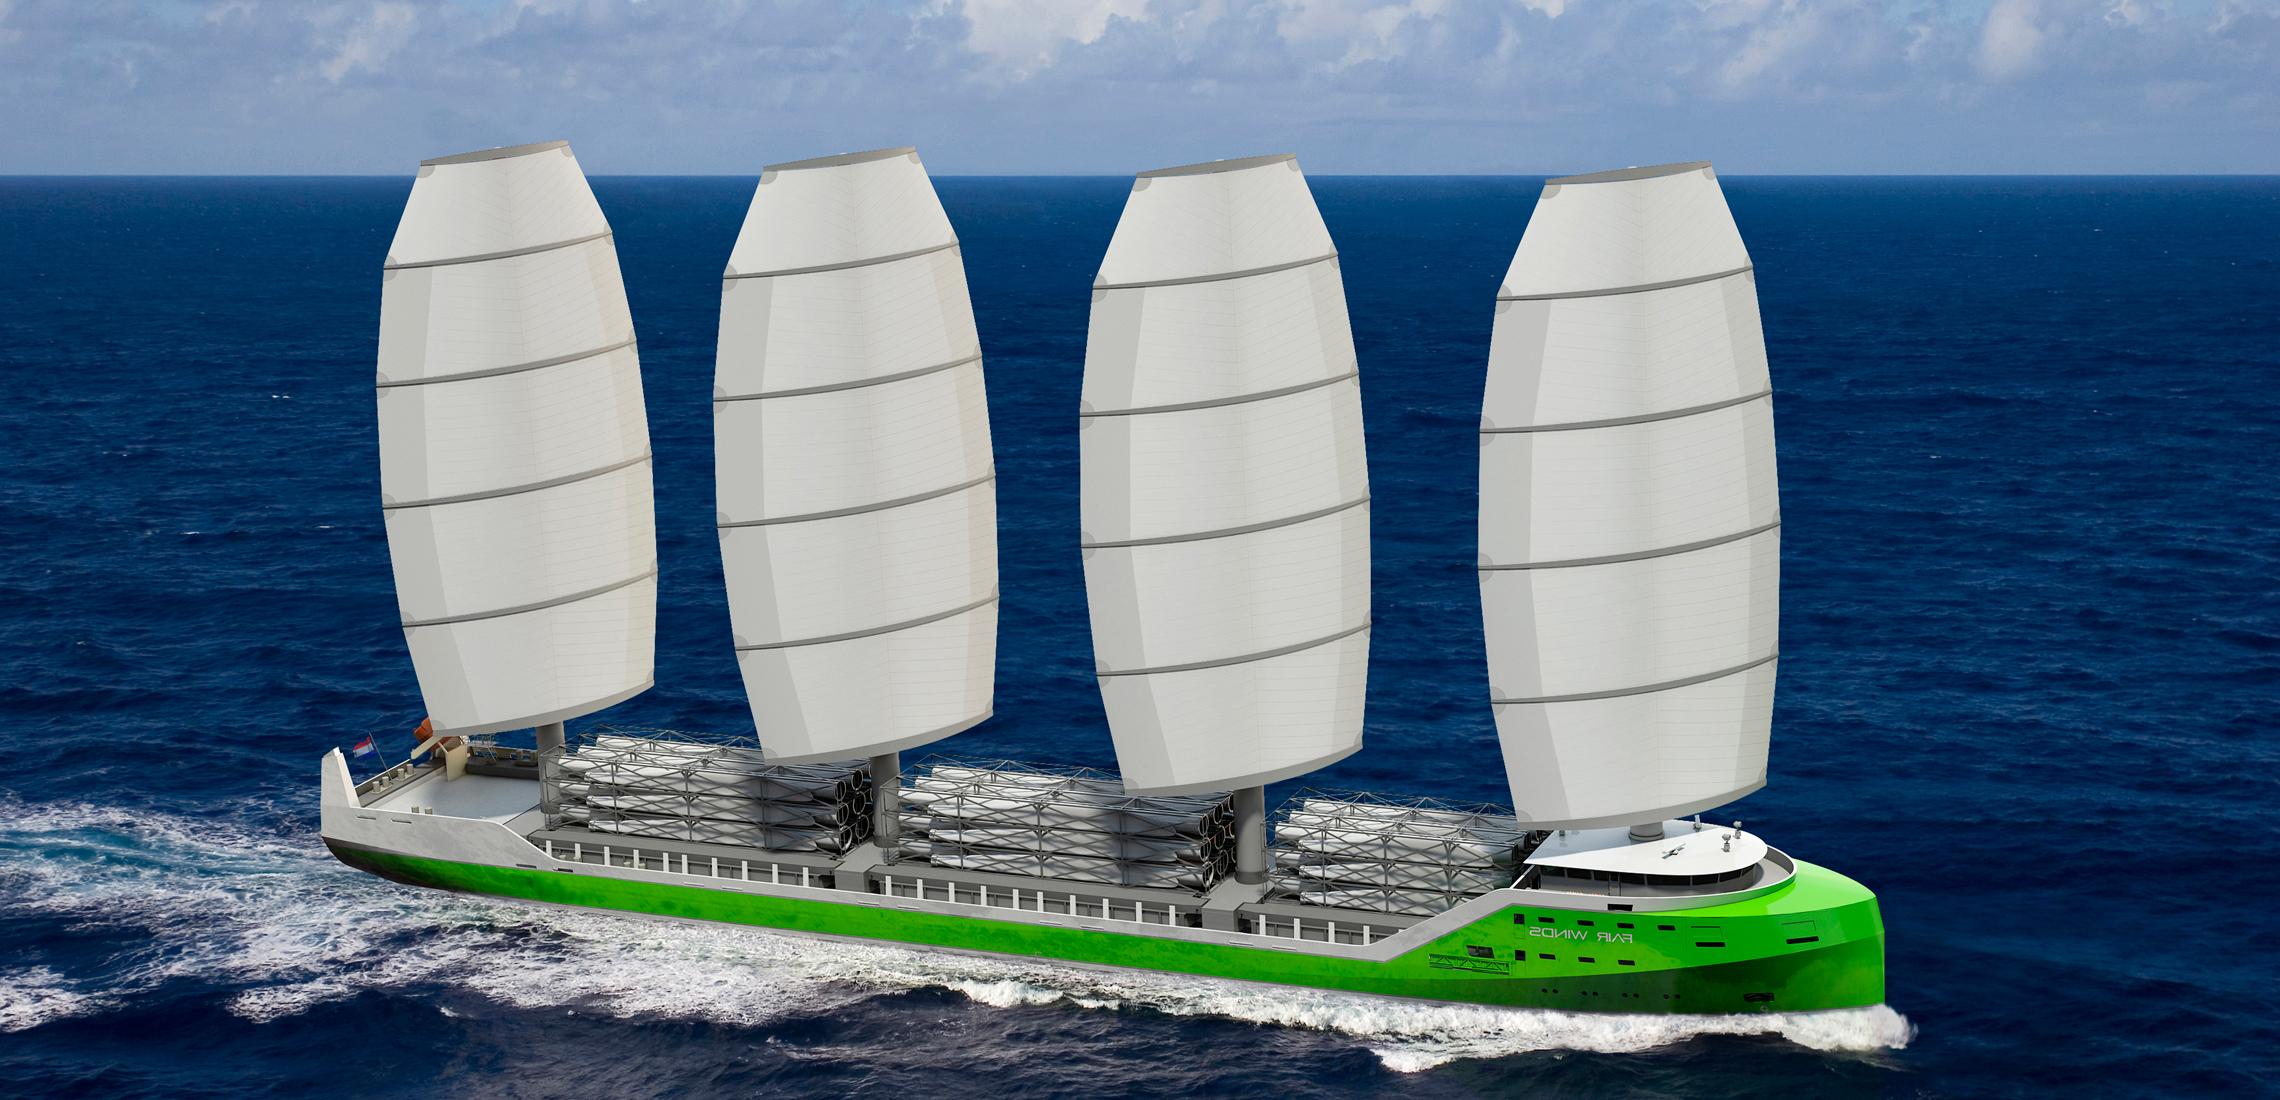 WASP (Ecoliner) – Dykstra Naval Architects